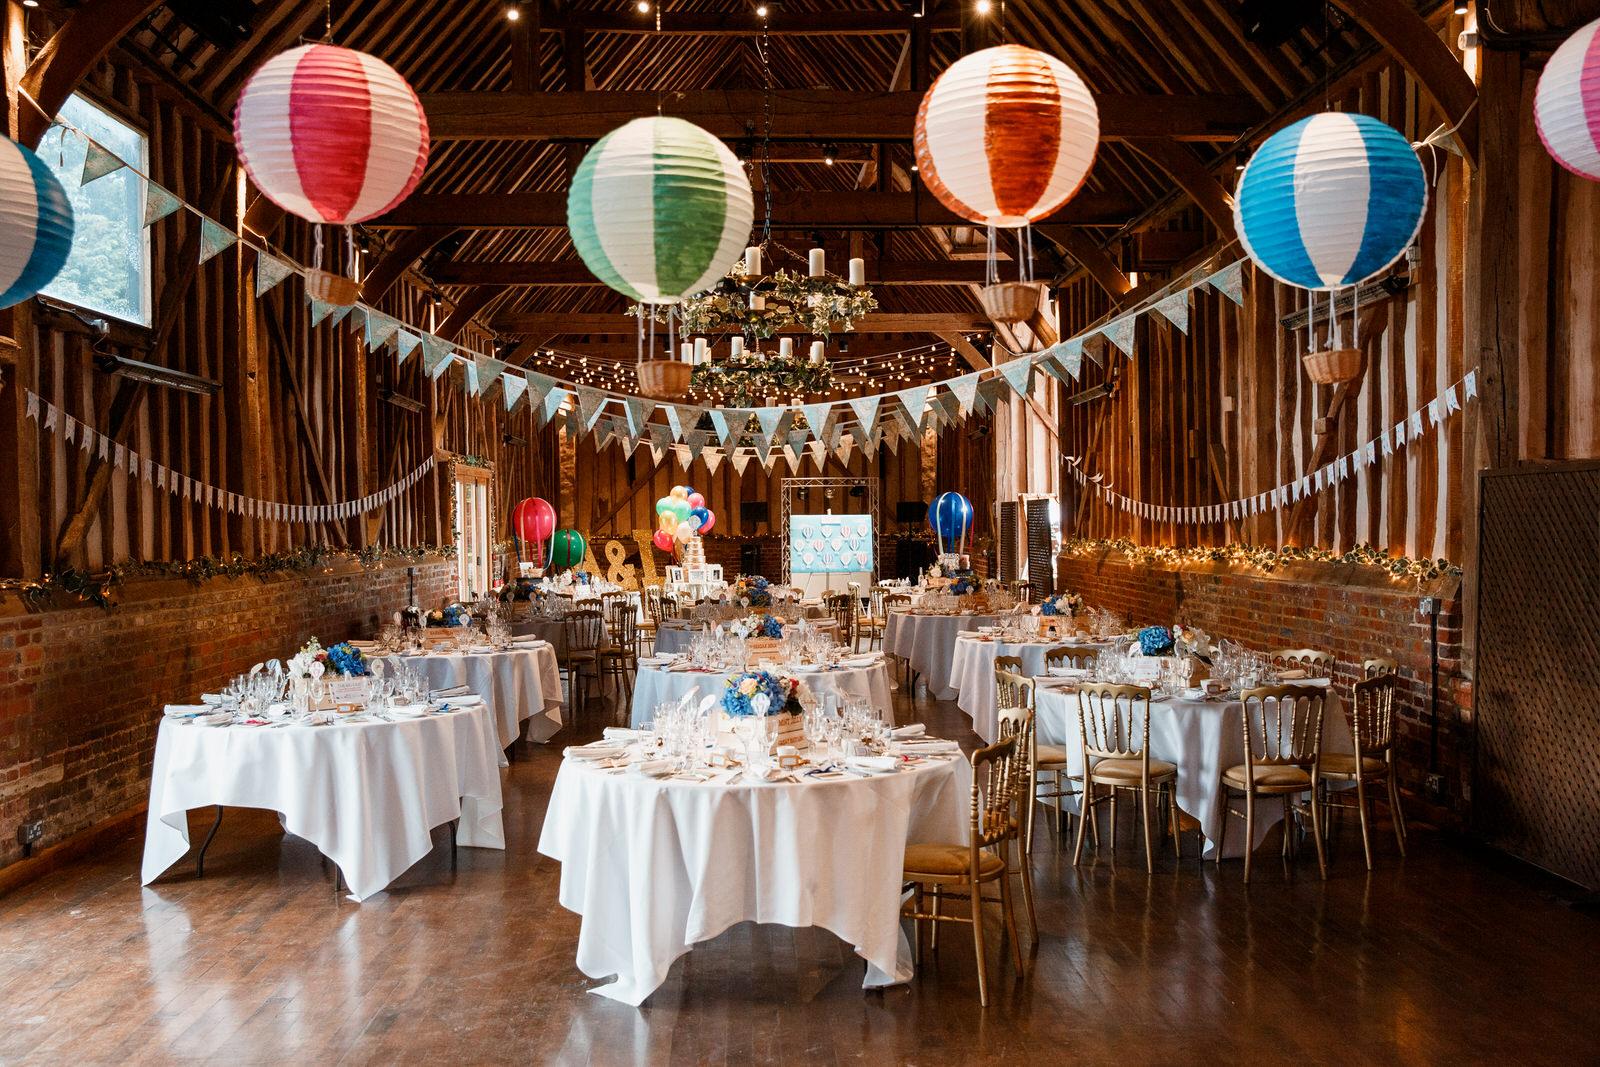 Home counties wedding photography by Damion Mower on English-Wedding.com (19)